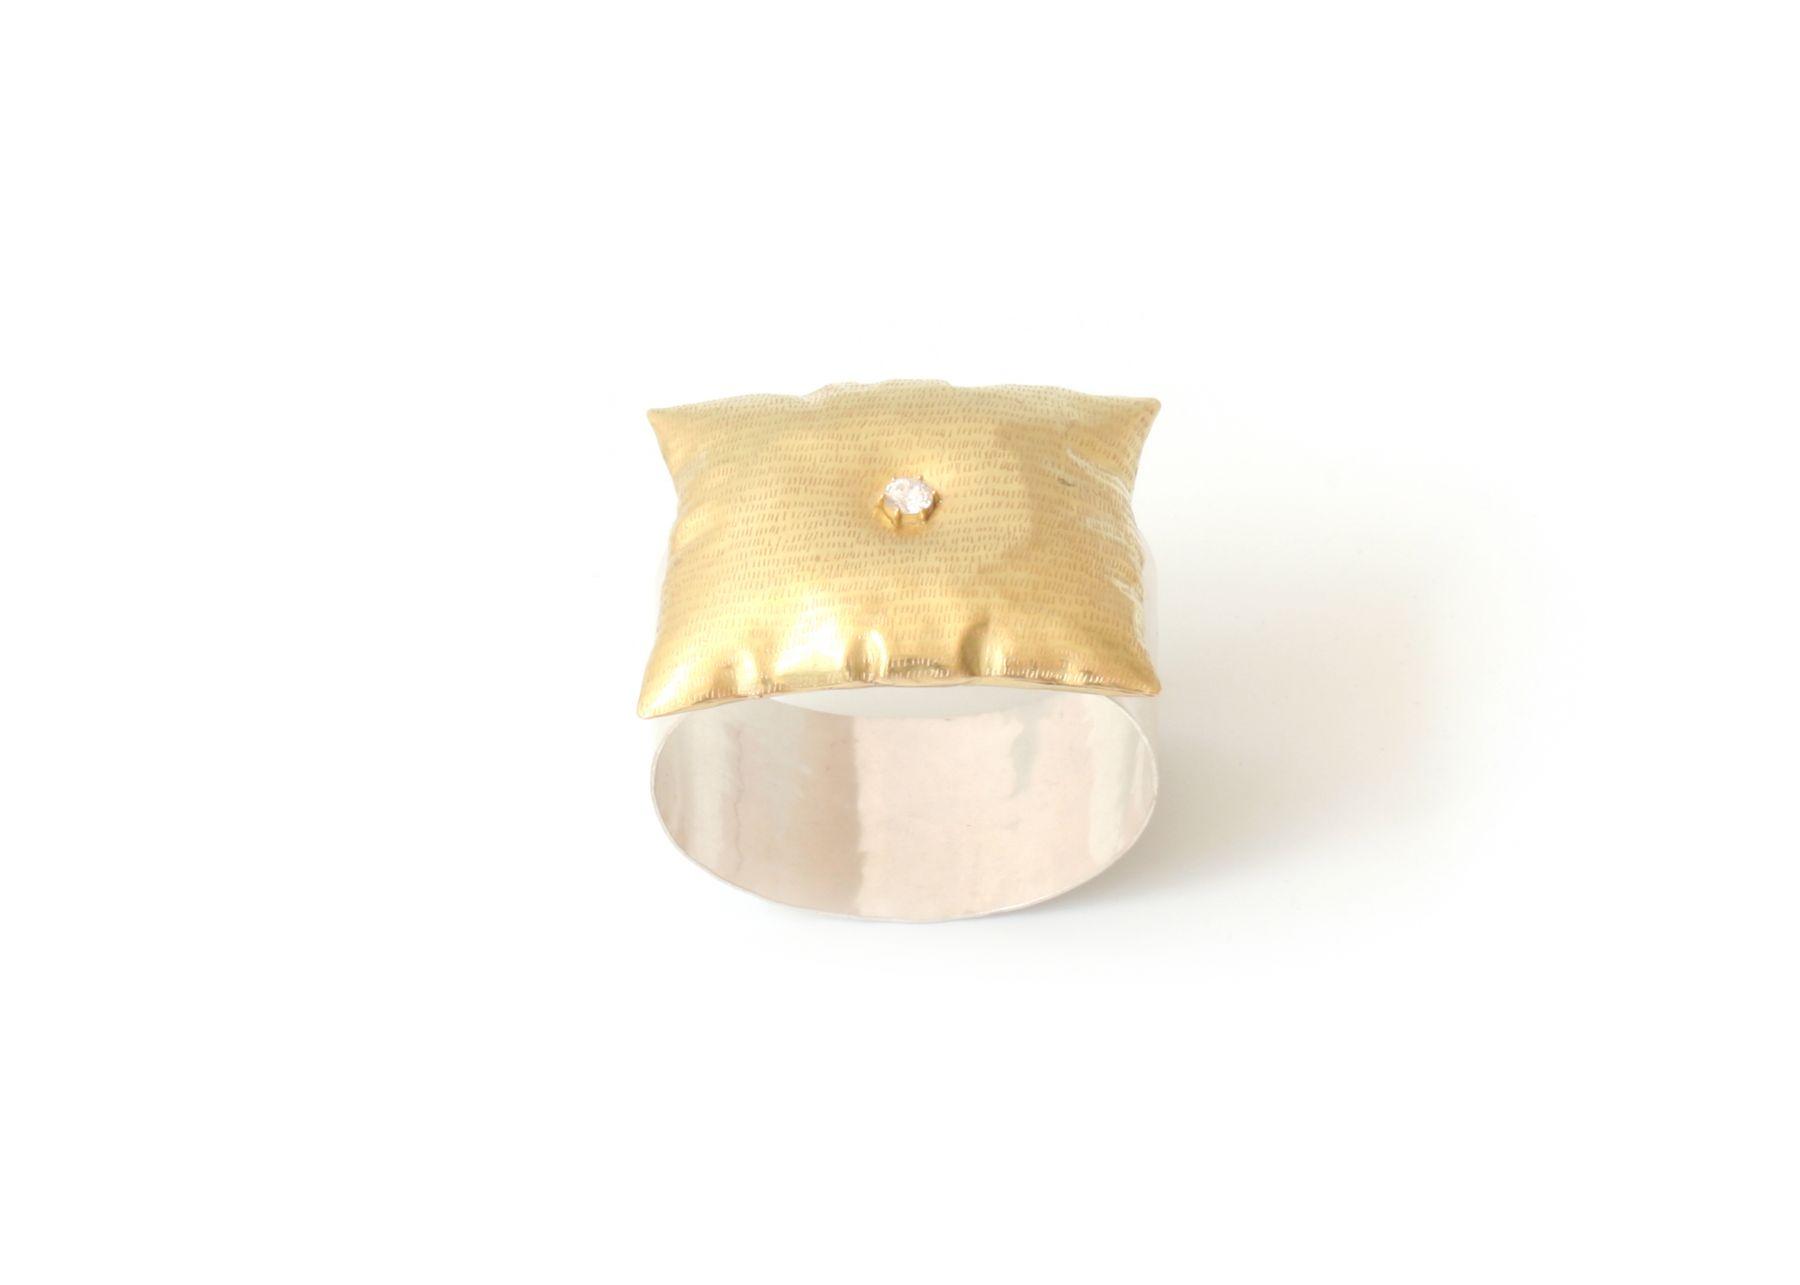 Gerd Rothmann, contemporary jewelry, German